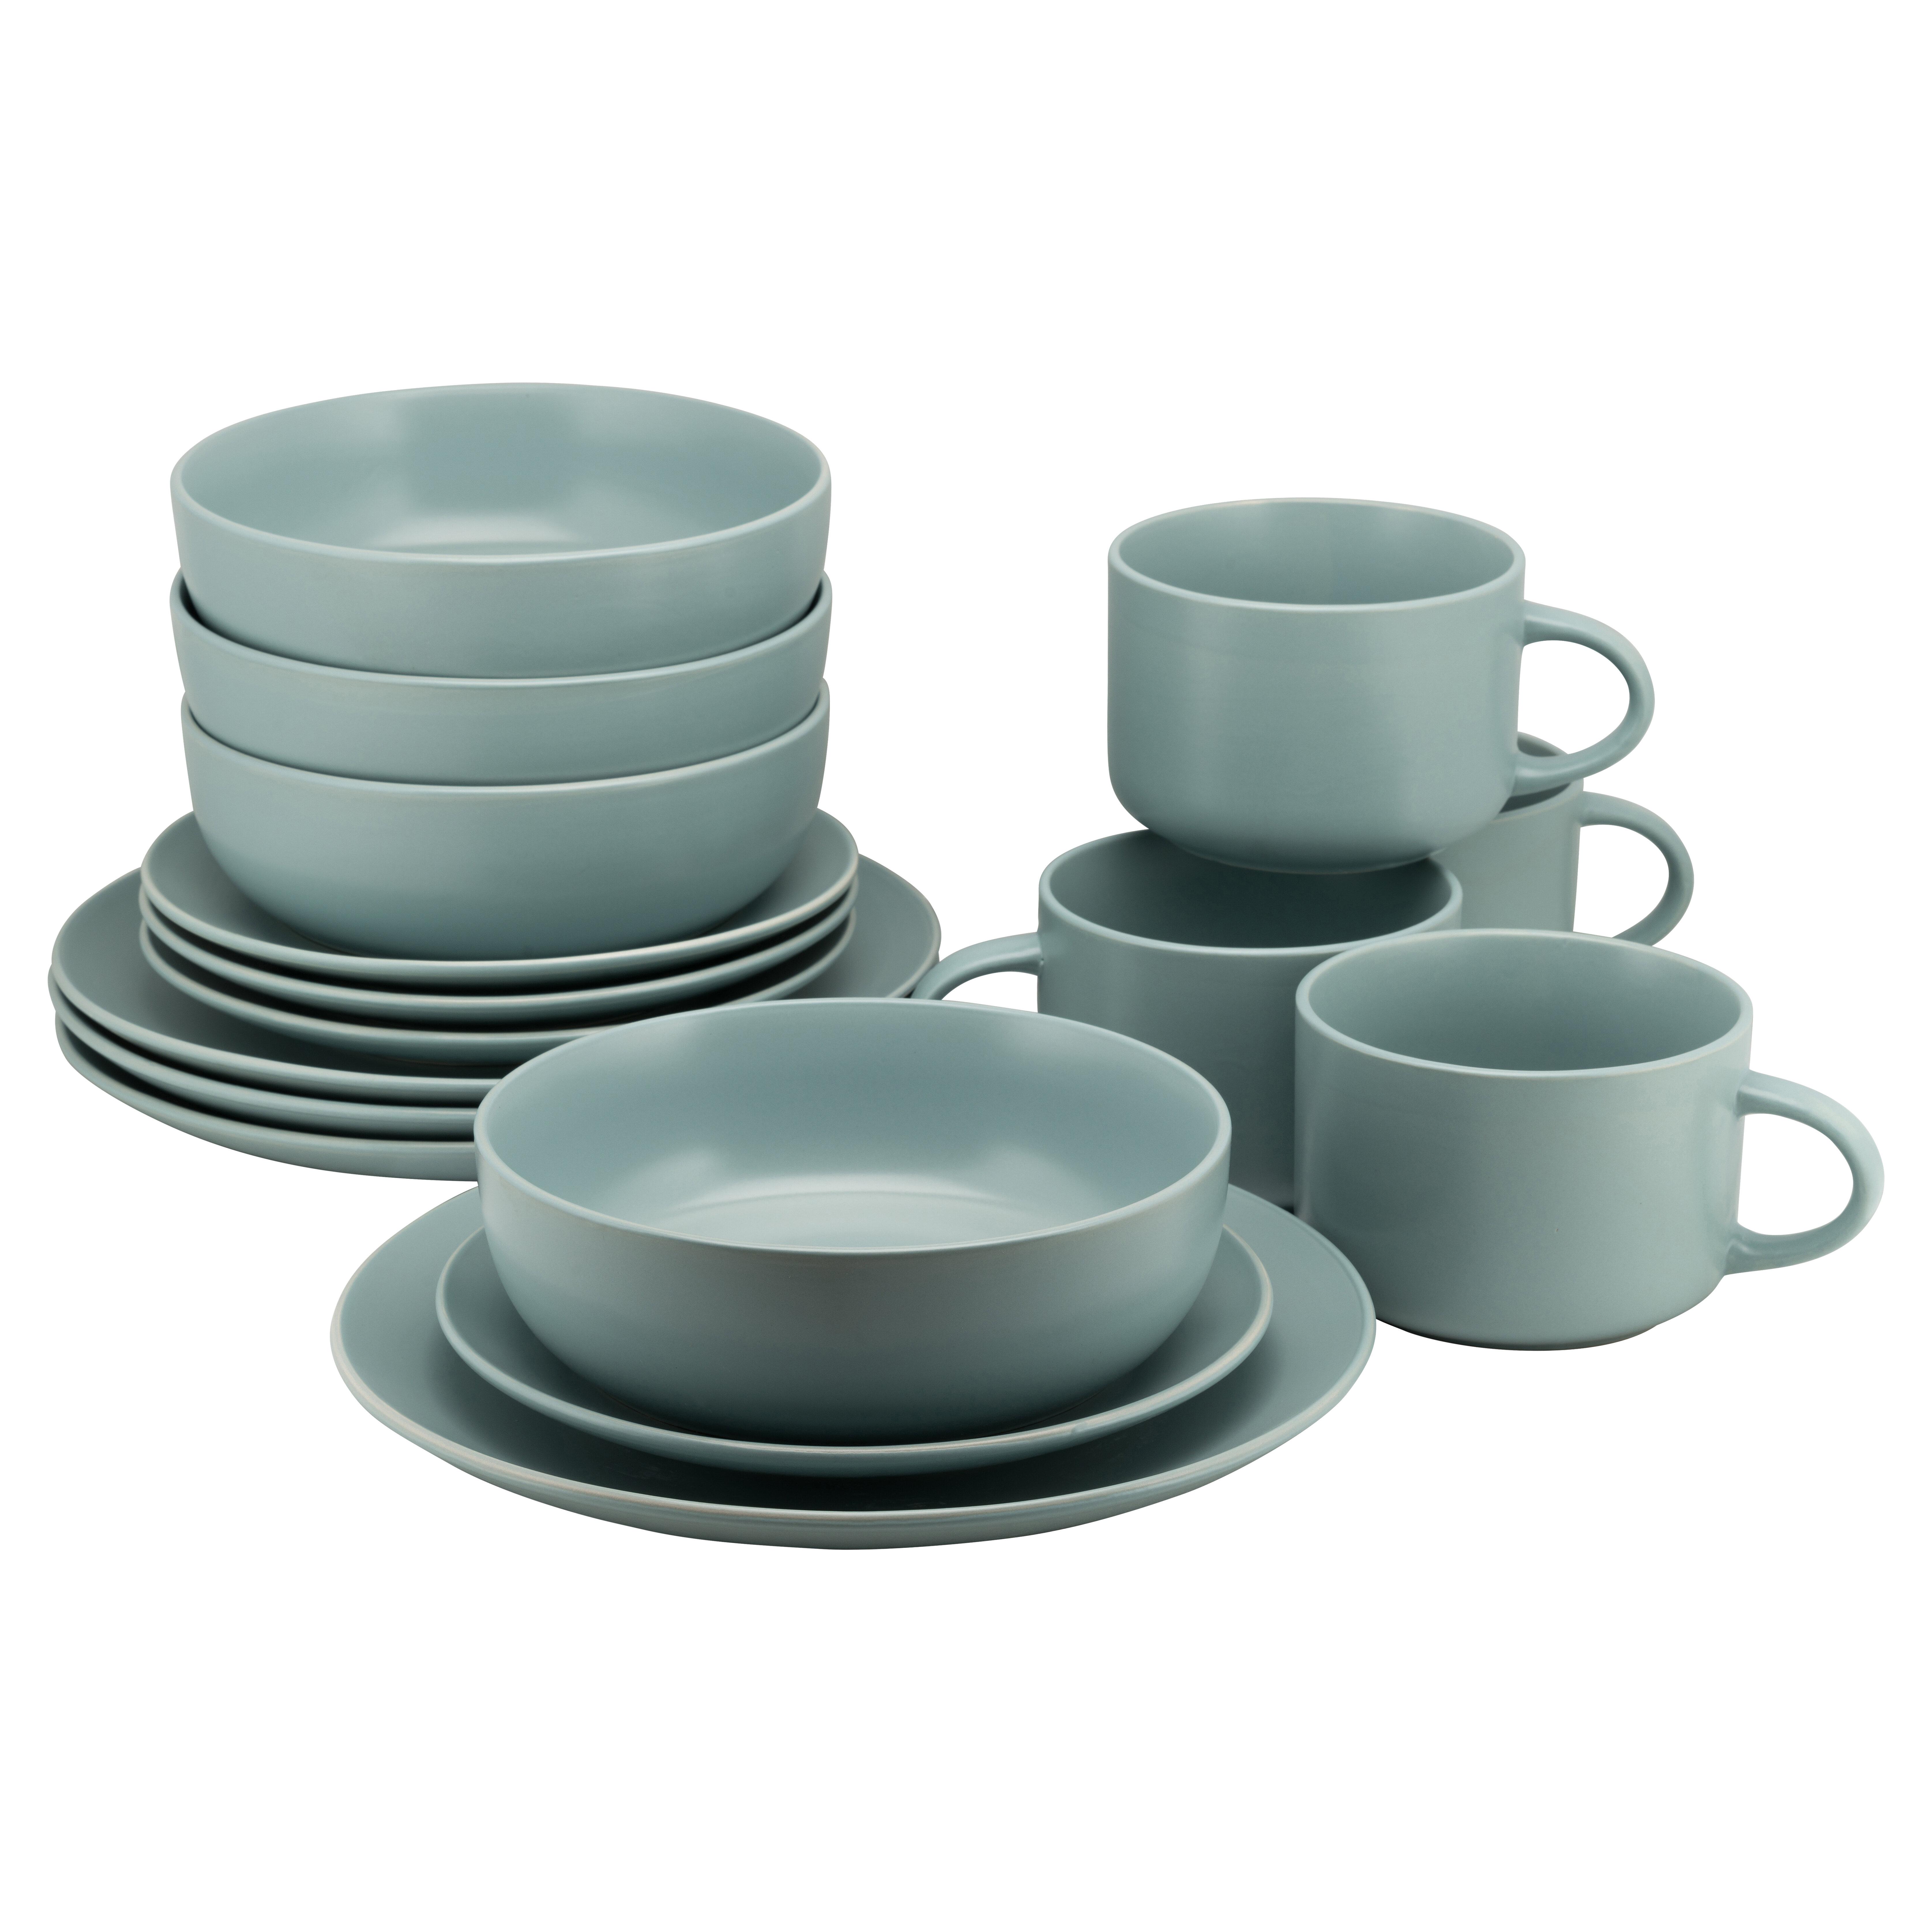 Wickham 16 Piece Dinnerware Set Service For 4 Reviews Joss Main